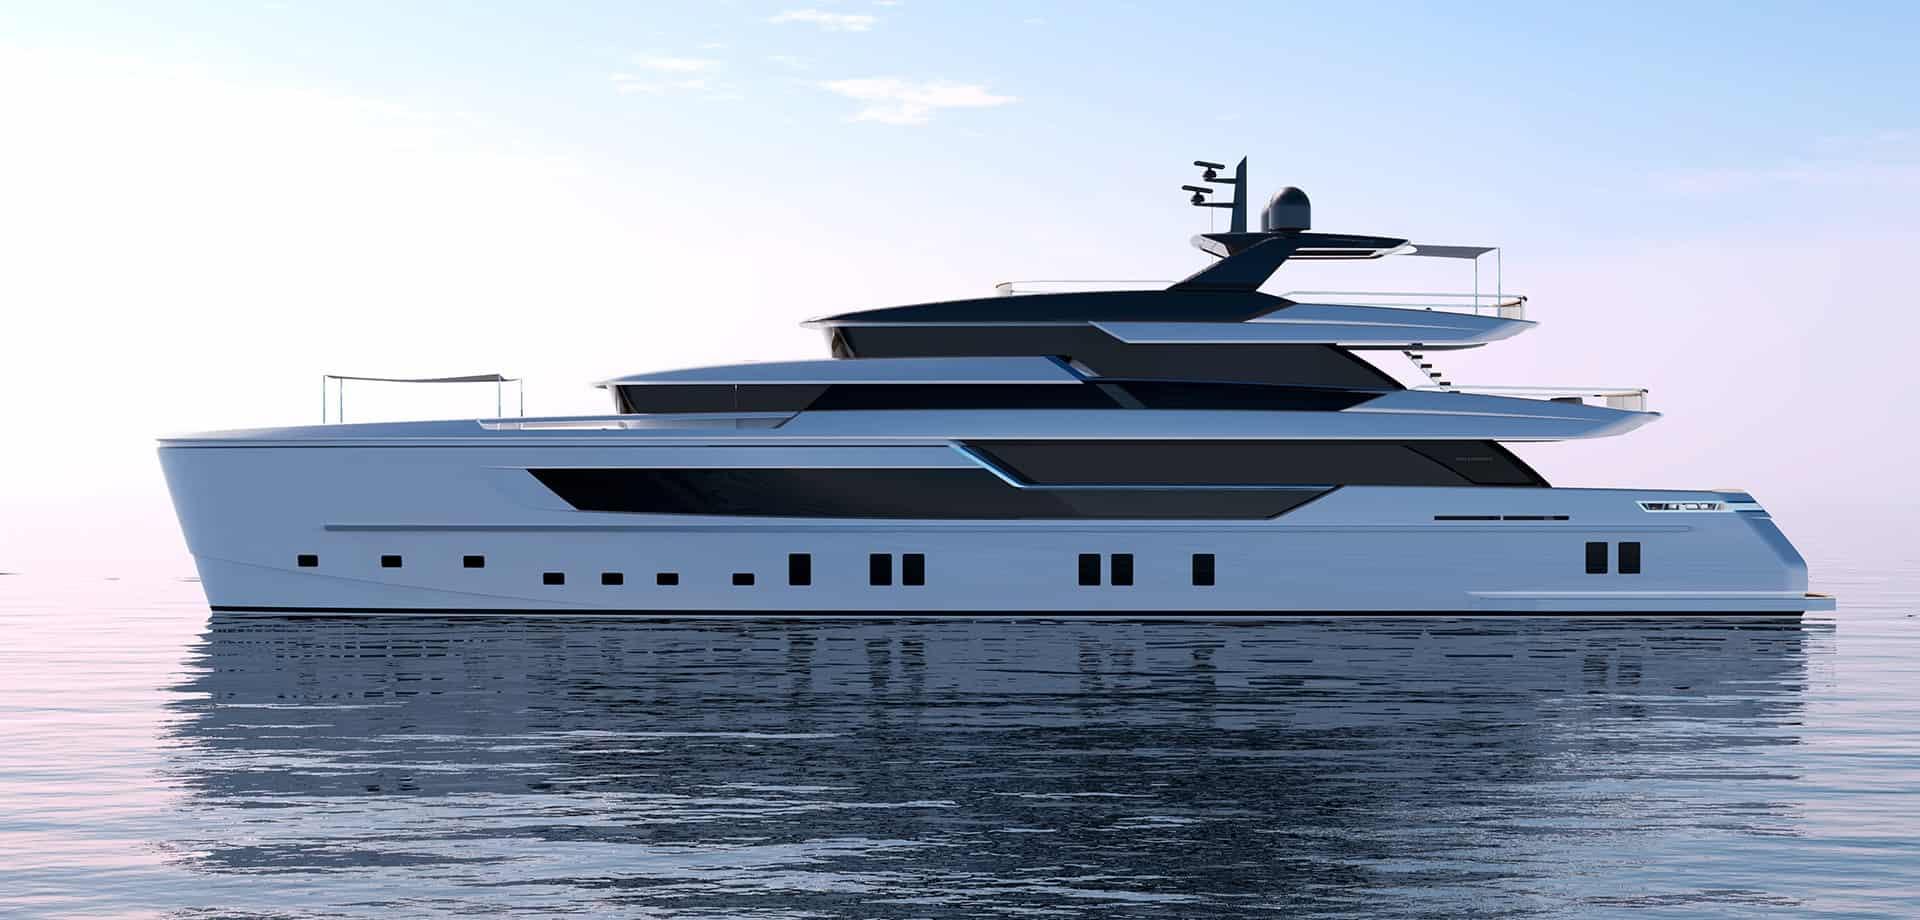 Sanlorenzo 44 Alloy Yacht